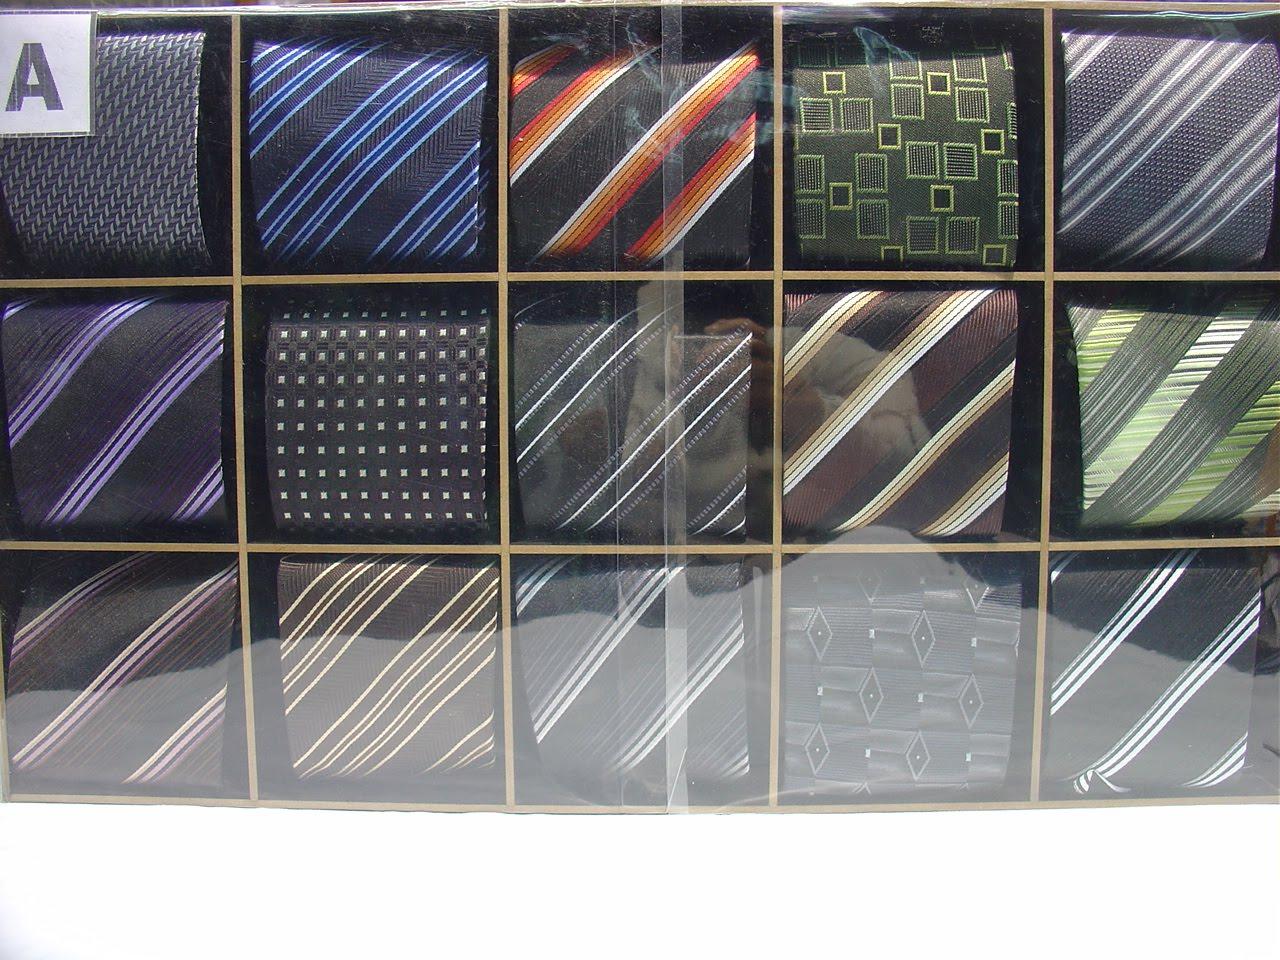 Camisas san diego chile nuevos dise os de corbatas for Disenos de corbatas